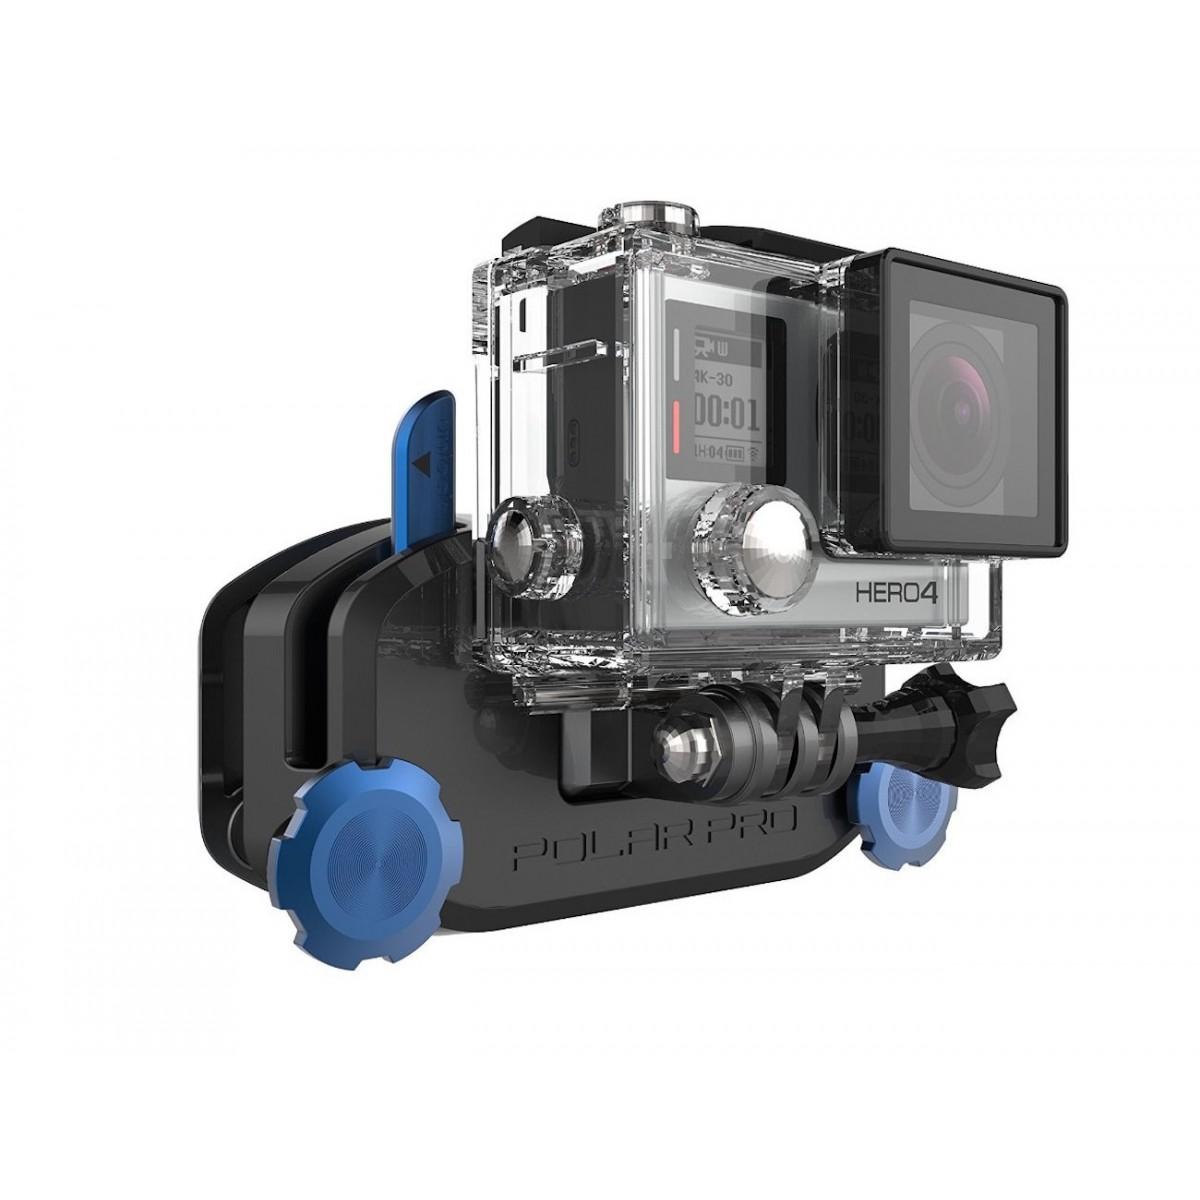 Suporte De Alça Peitoral De Mochila PolarPro Para GoPro - StrapMount